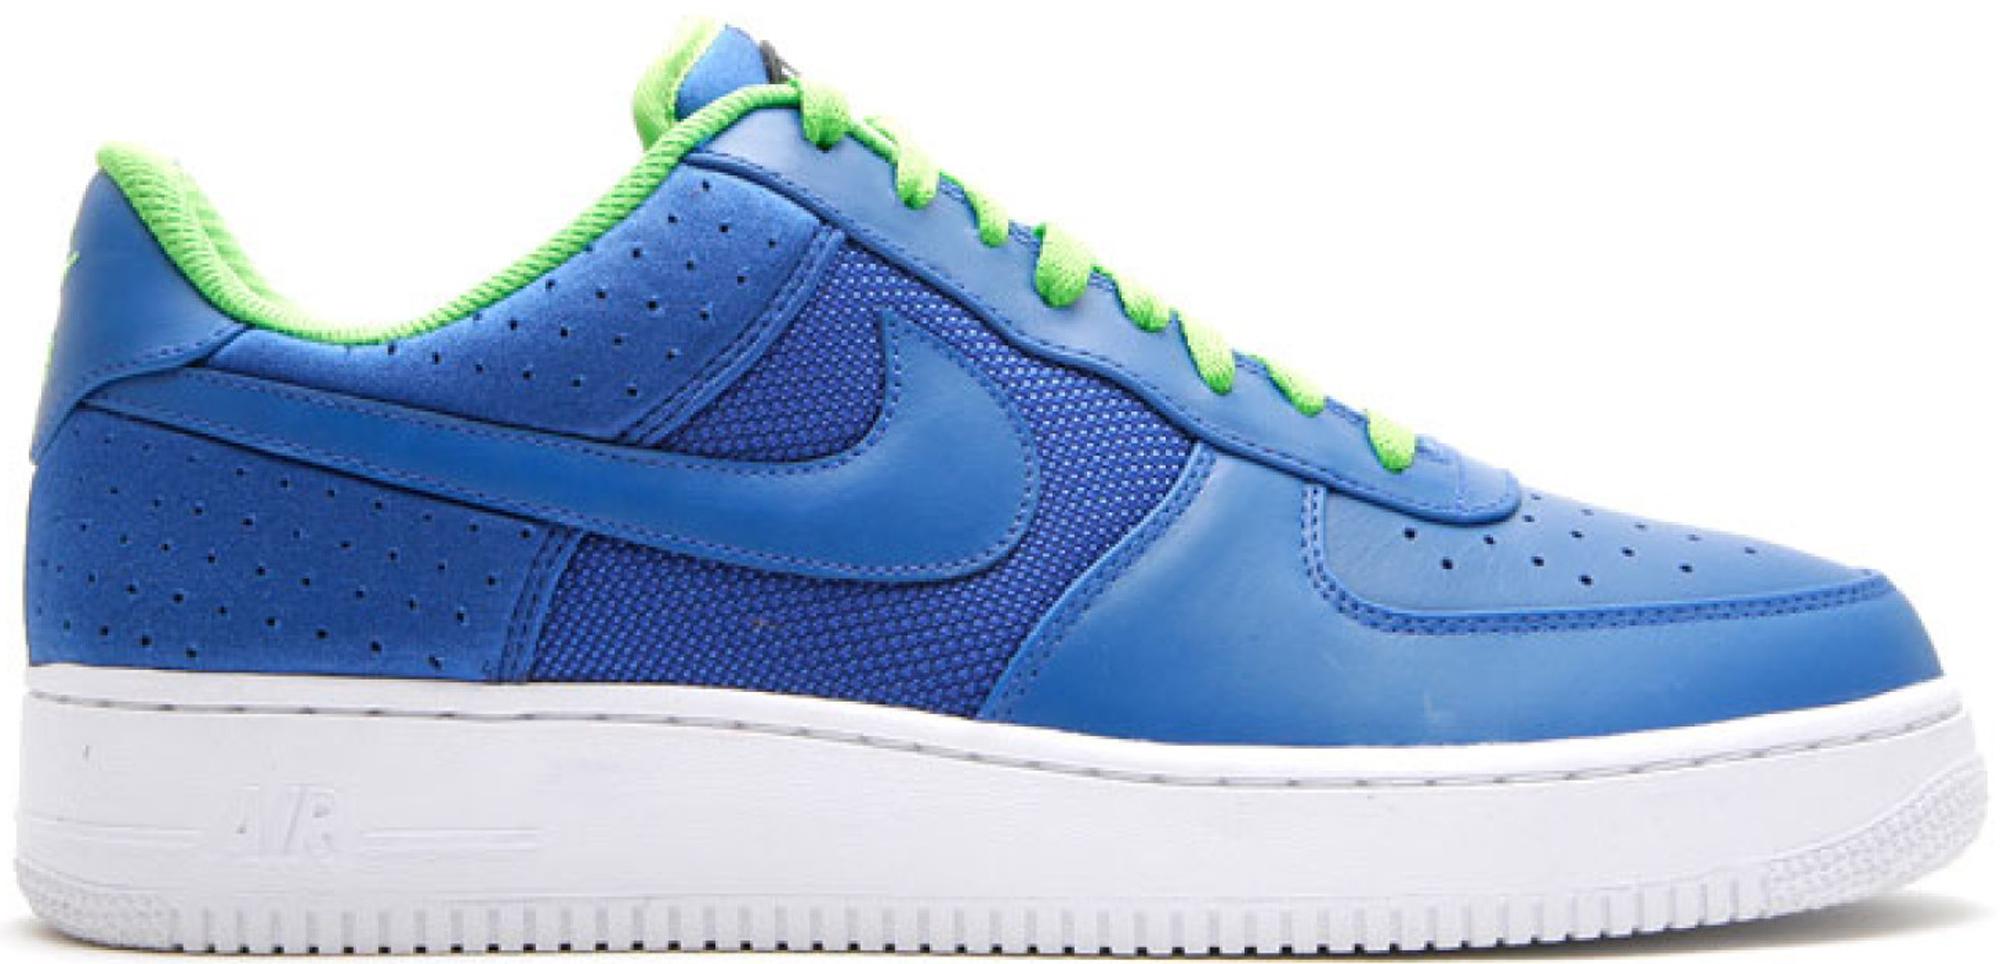 Nike Air Force 1 Low Huarache Blue